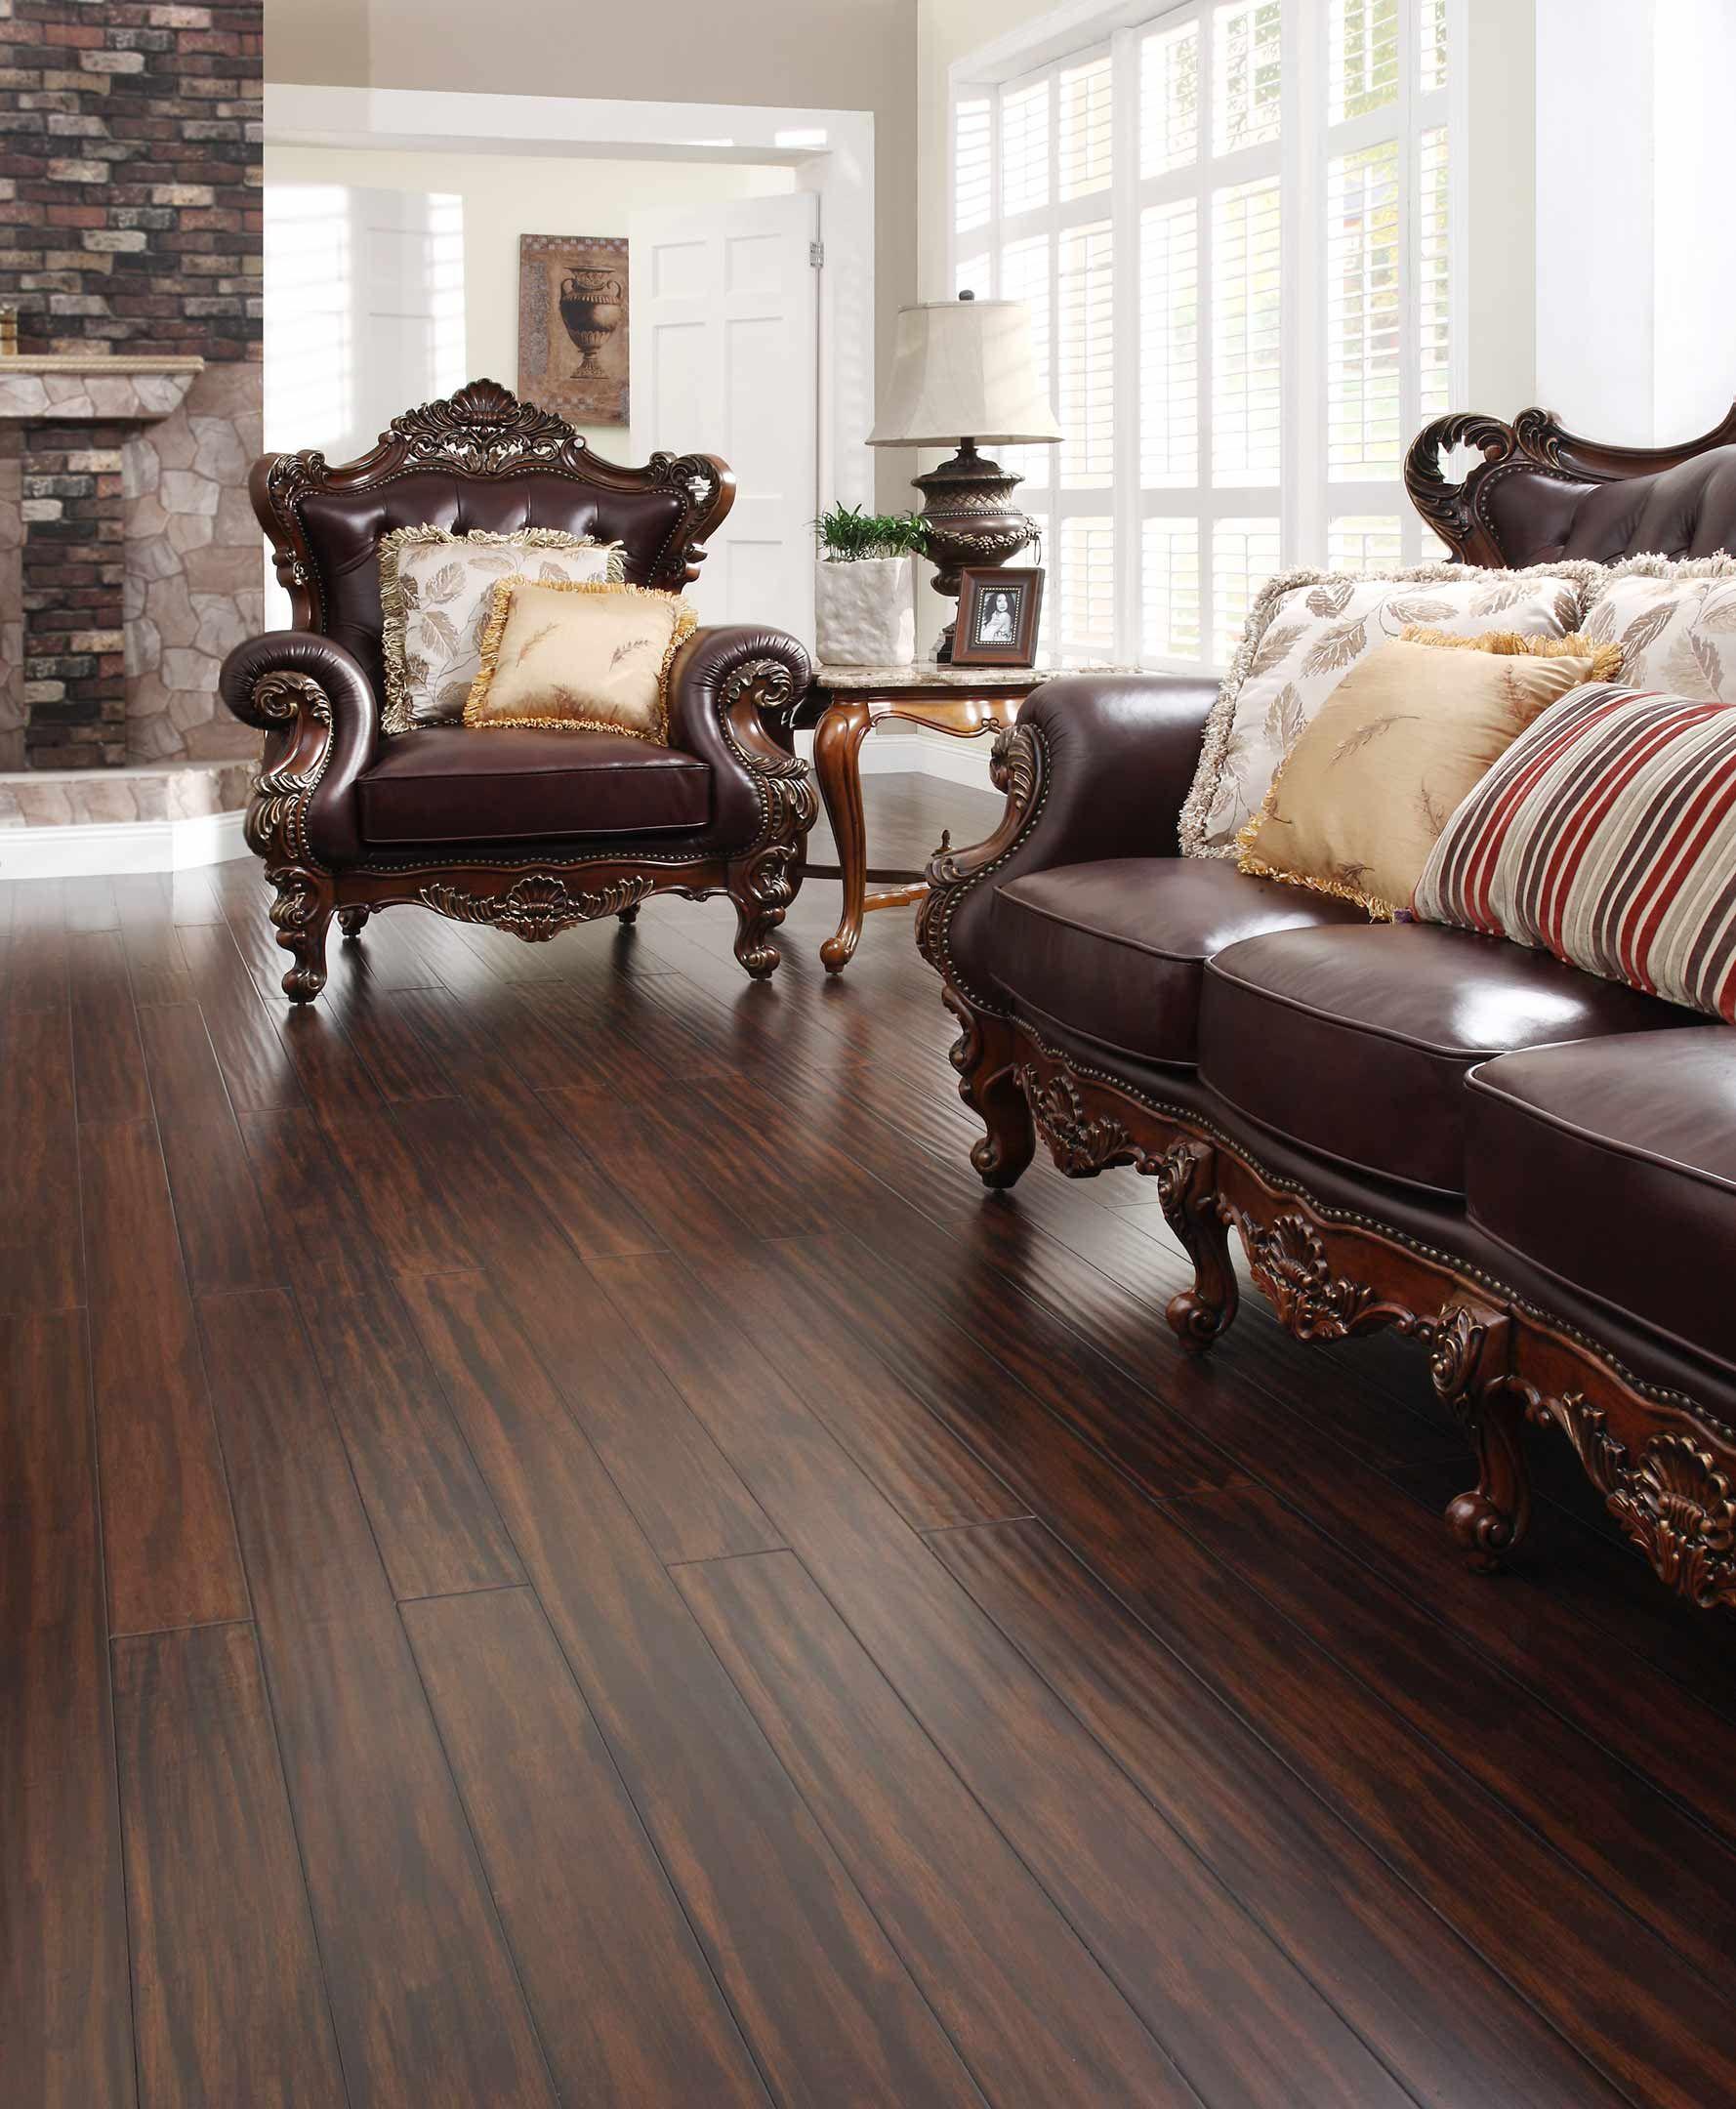 Flooring Hardwood Bamboo Tile Linoleum Floor Tile That